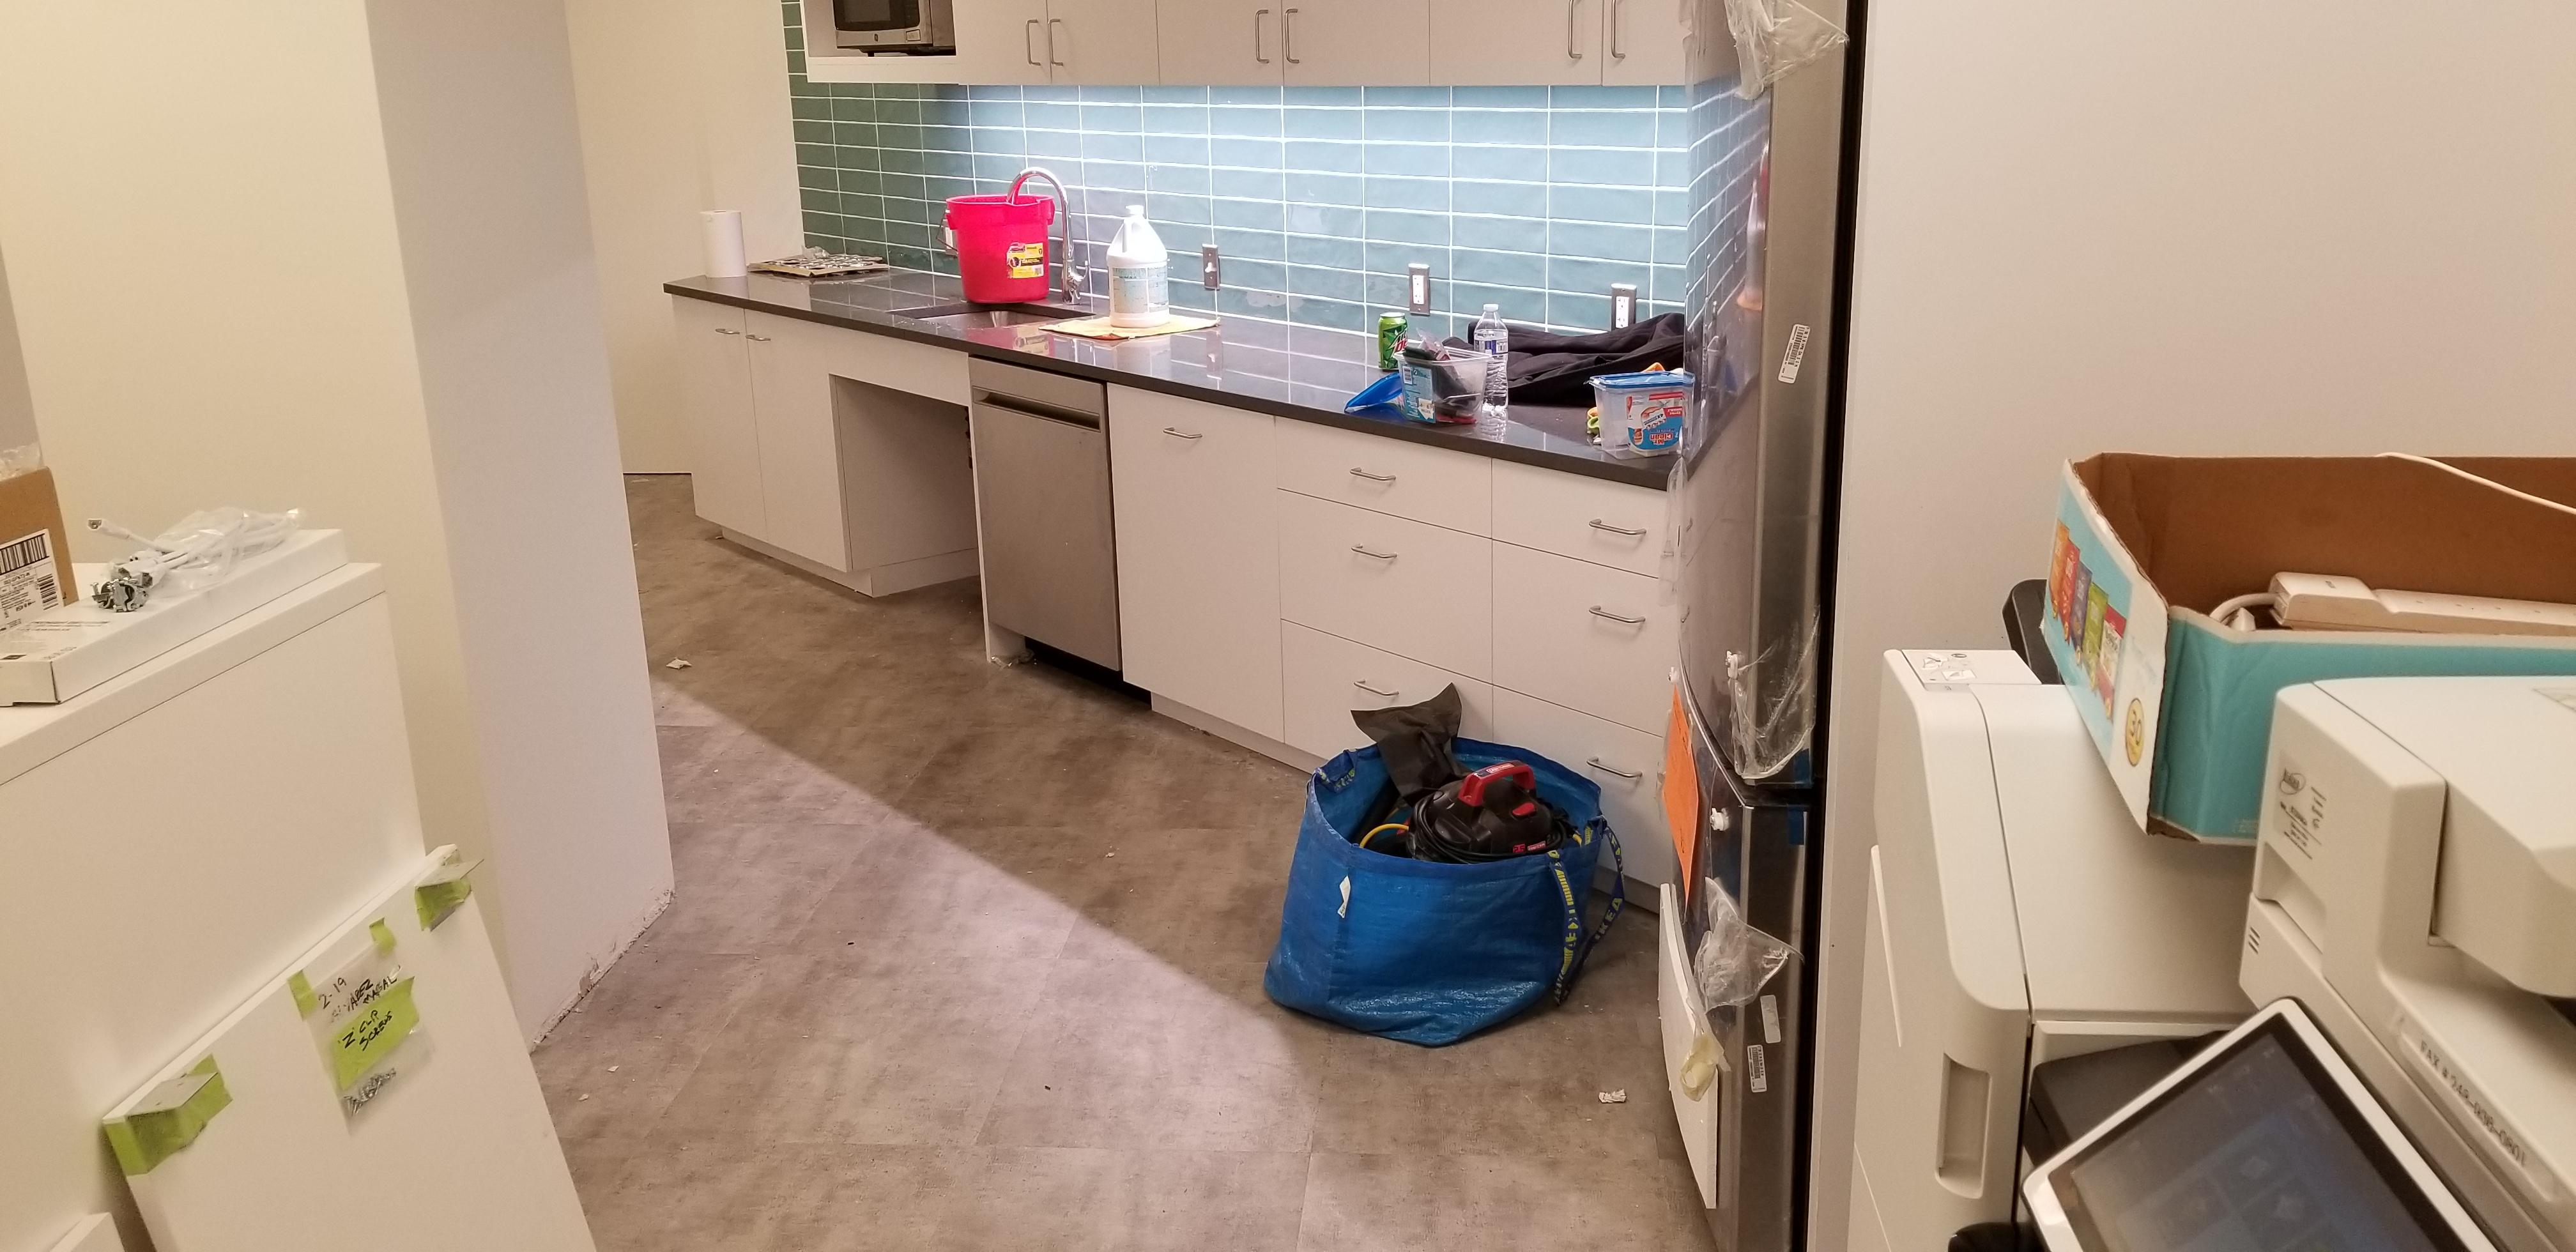 Construction Clean Up, Kitchen